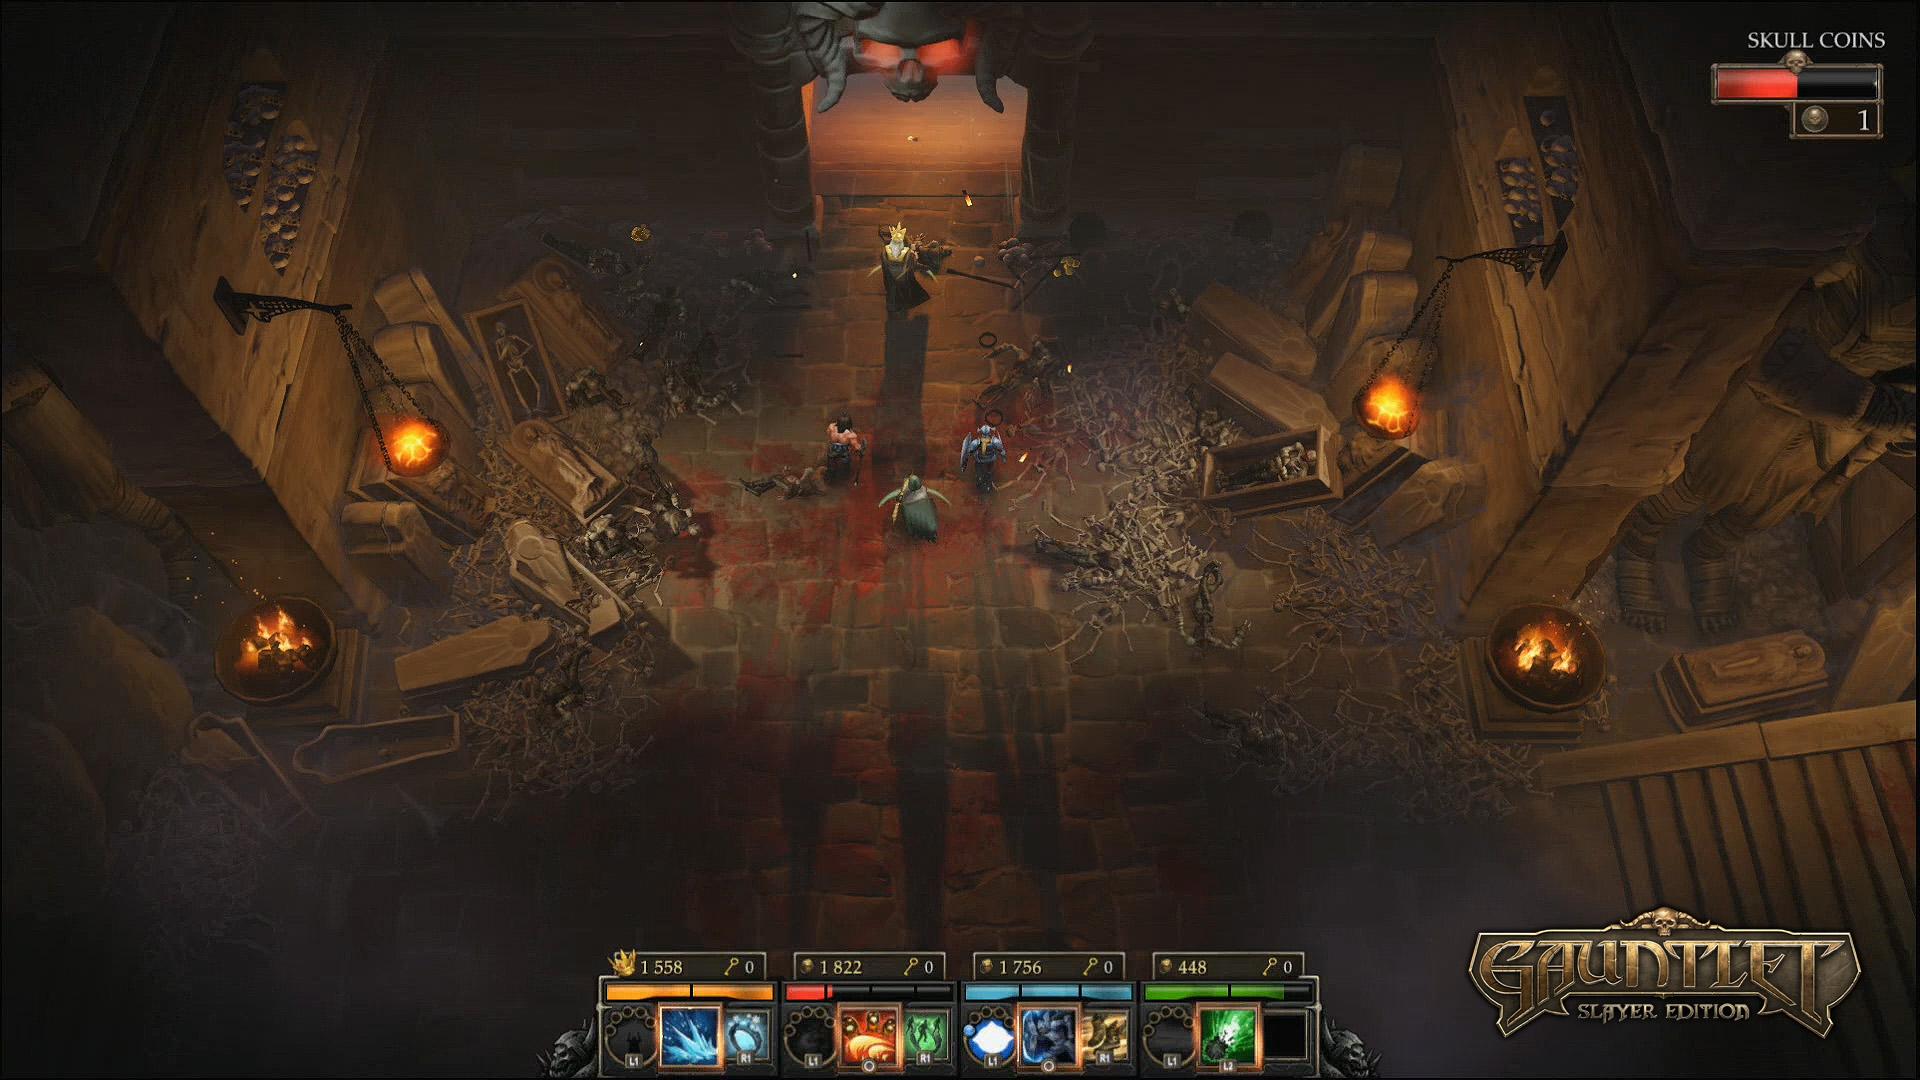 Gauntlet Slayer Edition gameplay 4